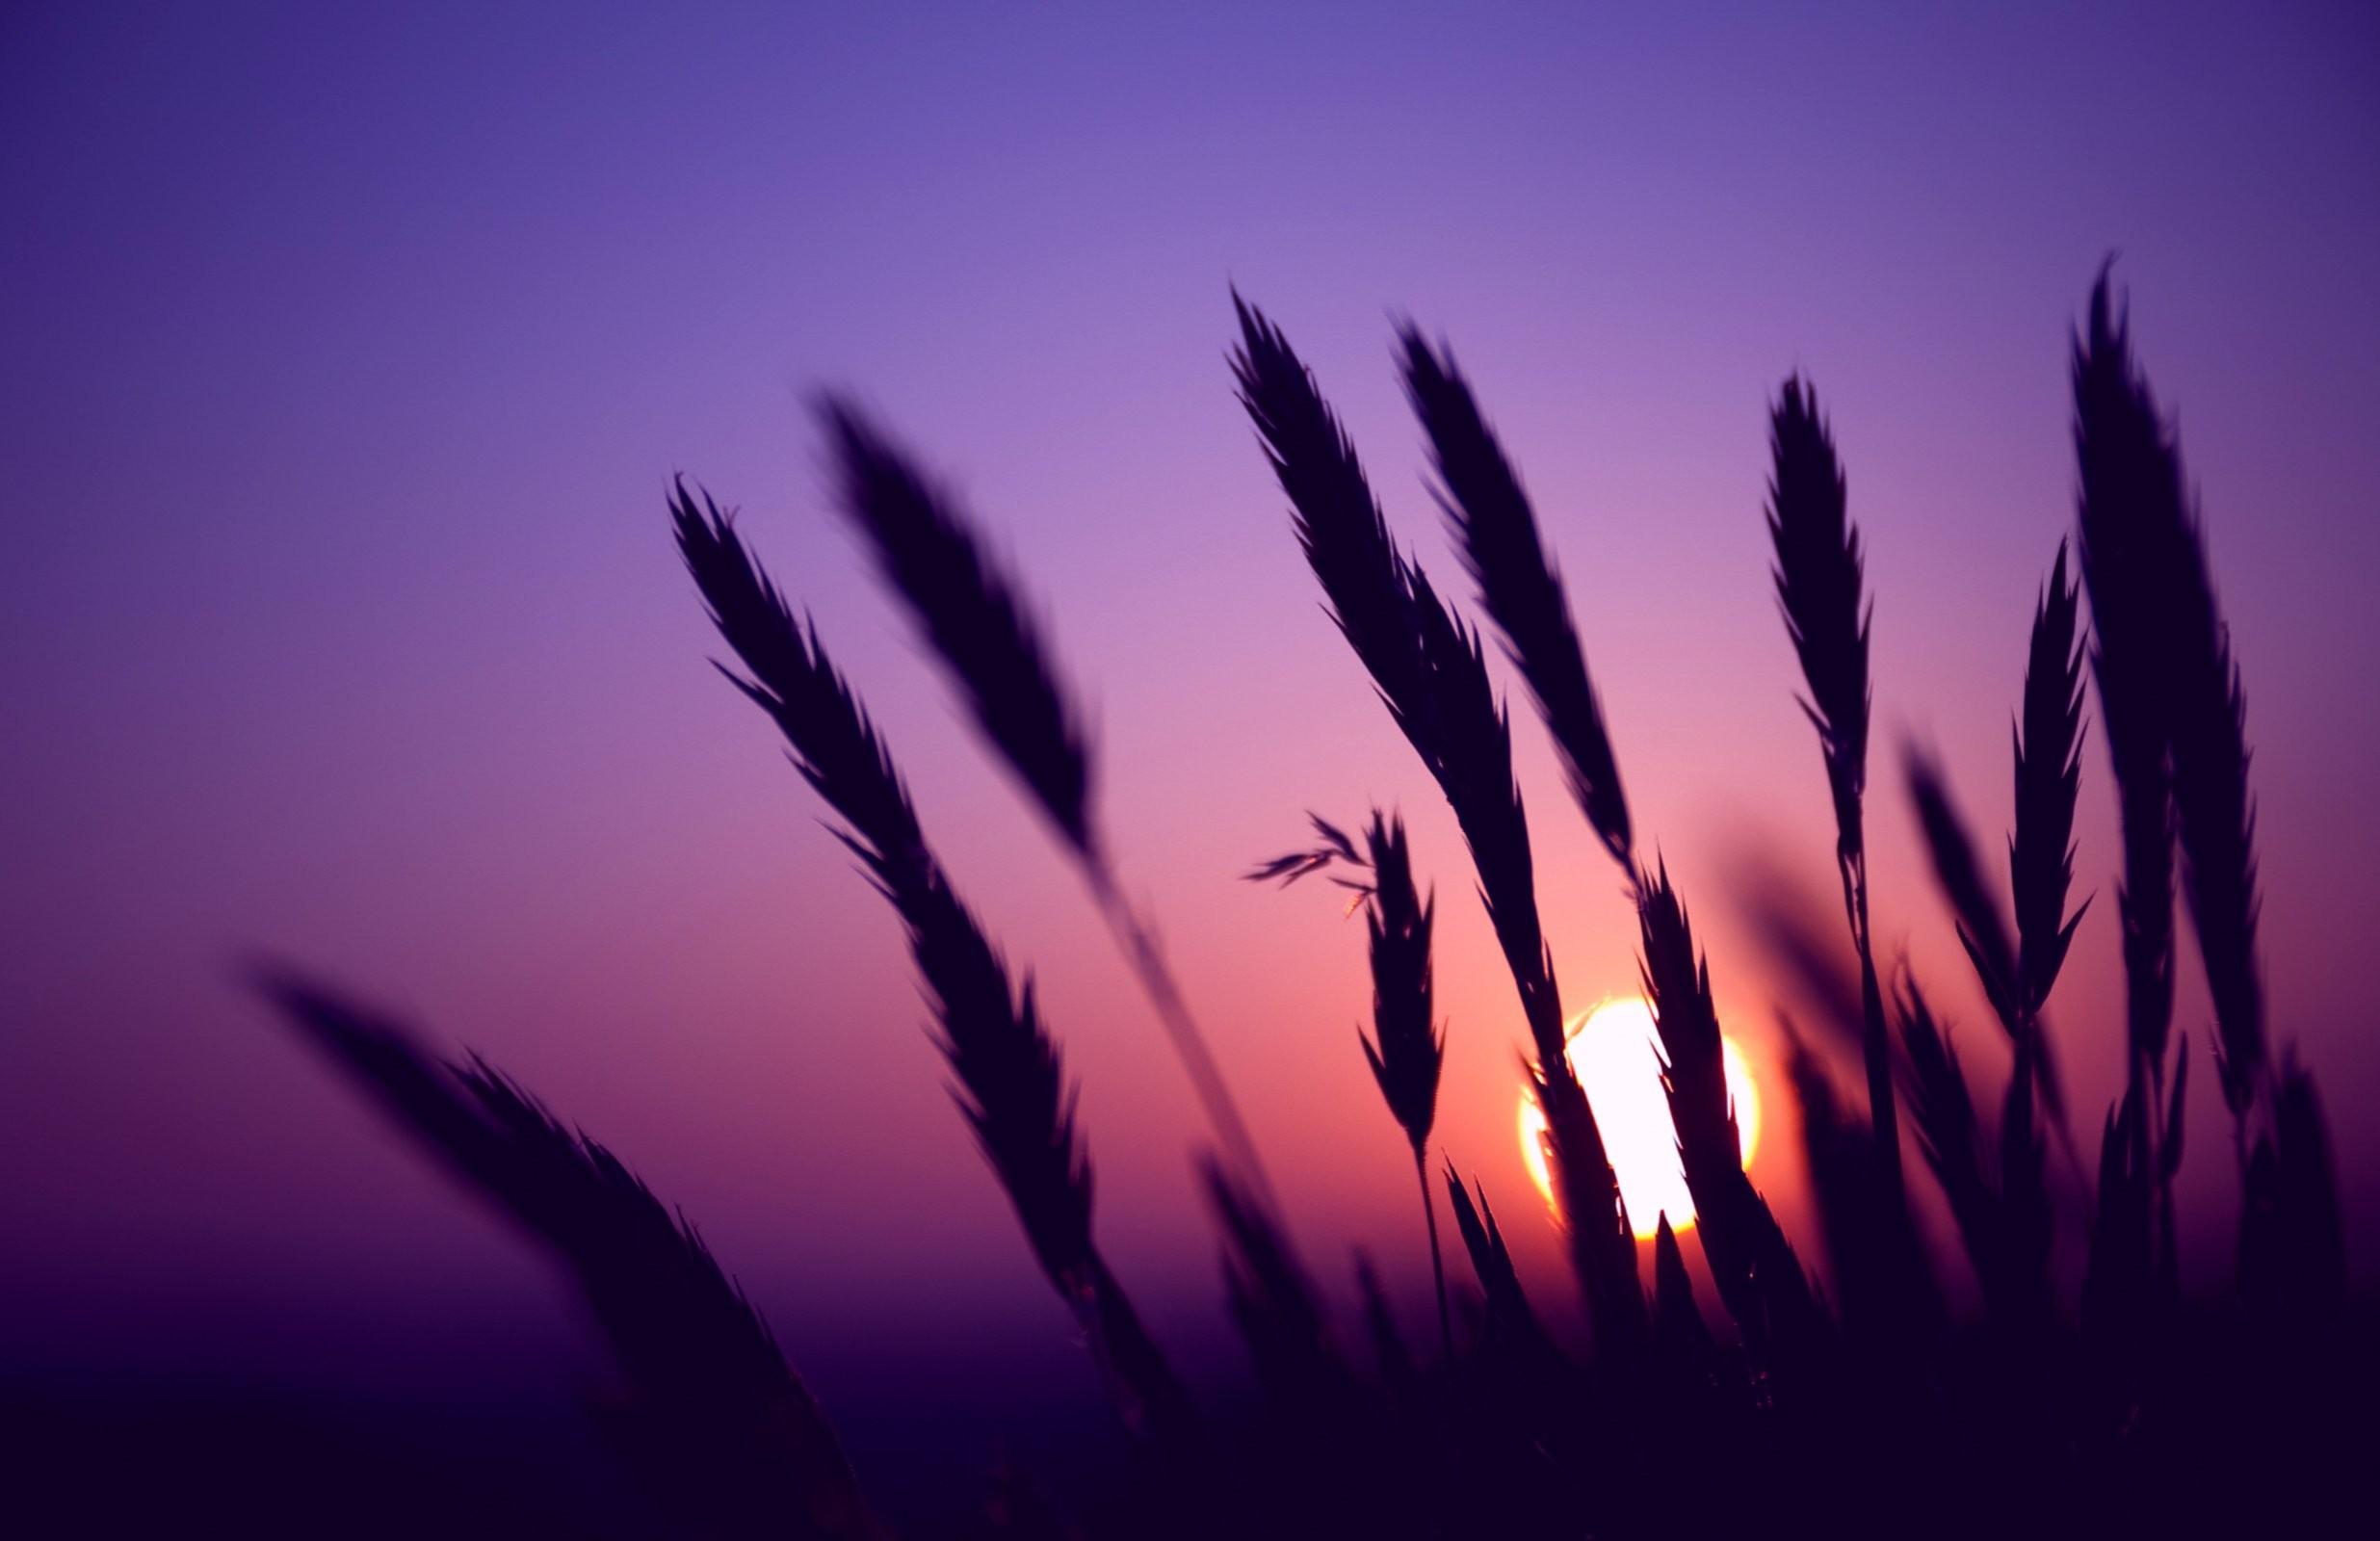 … purple-sunset-wallpapers-hd …